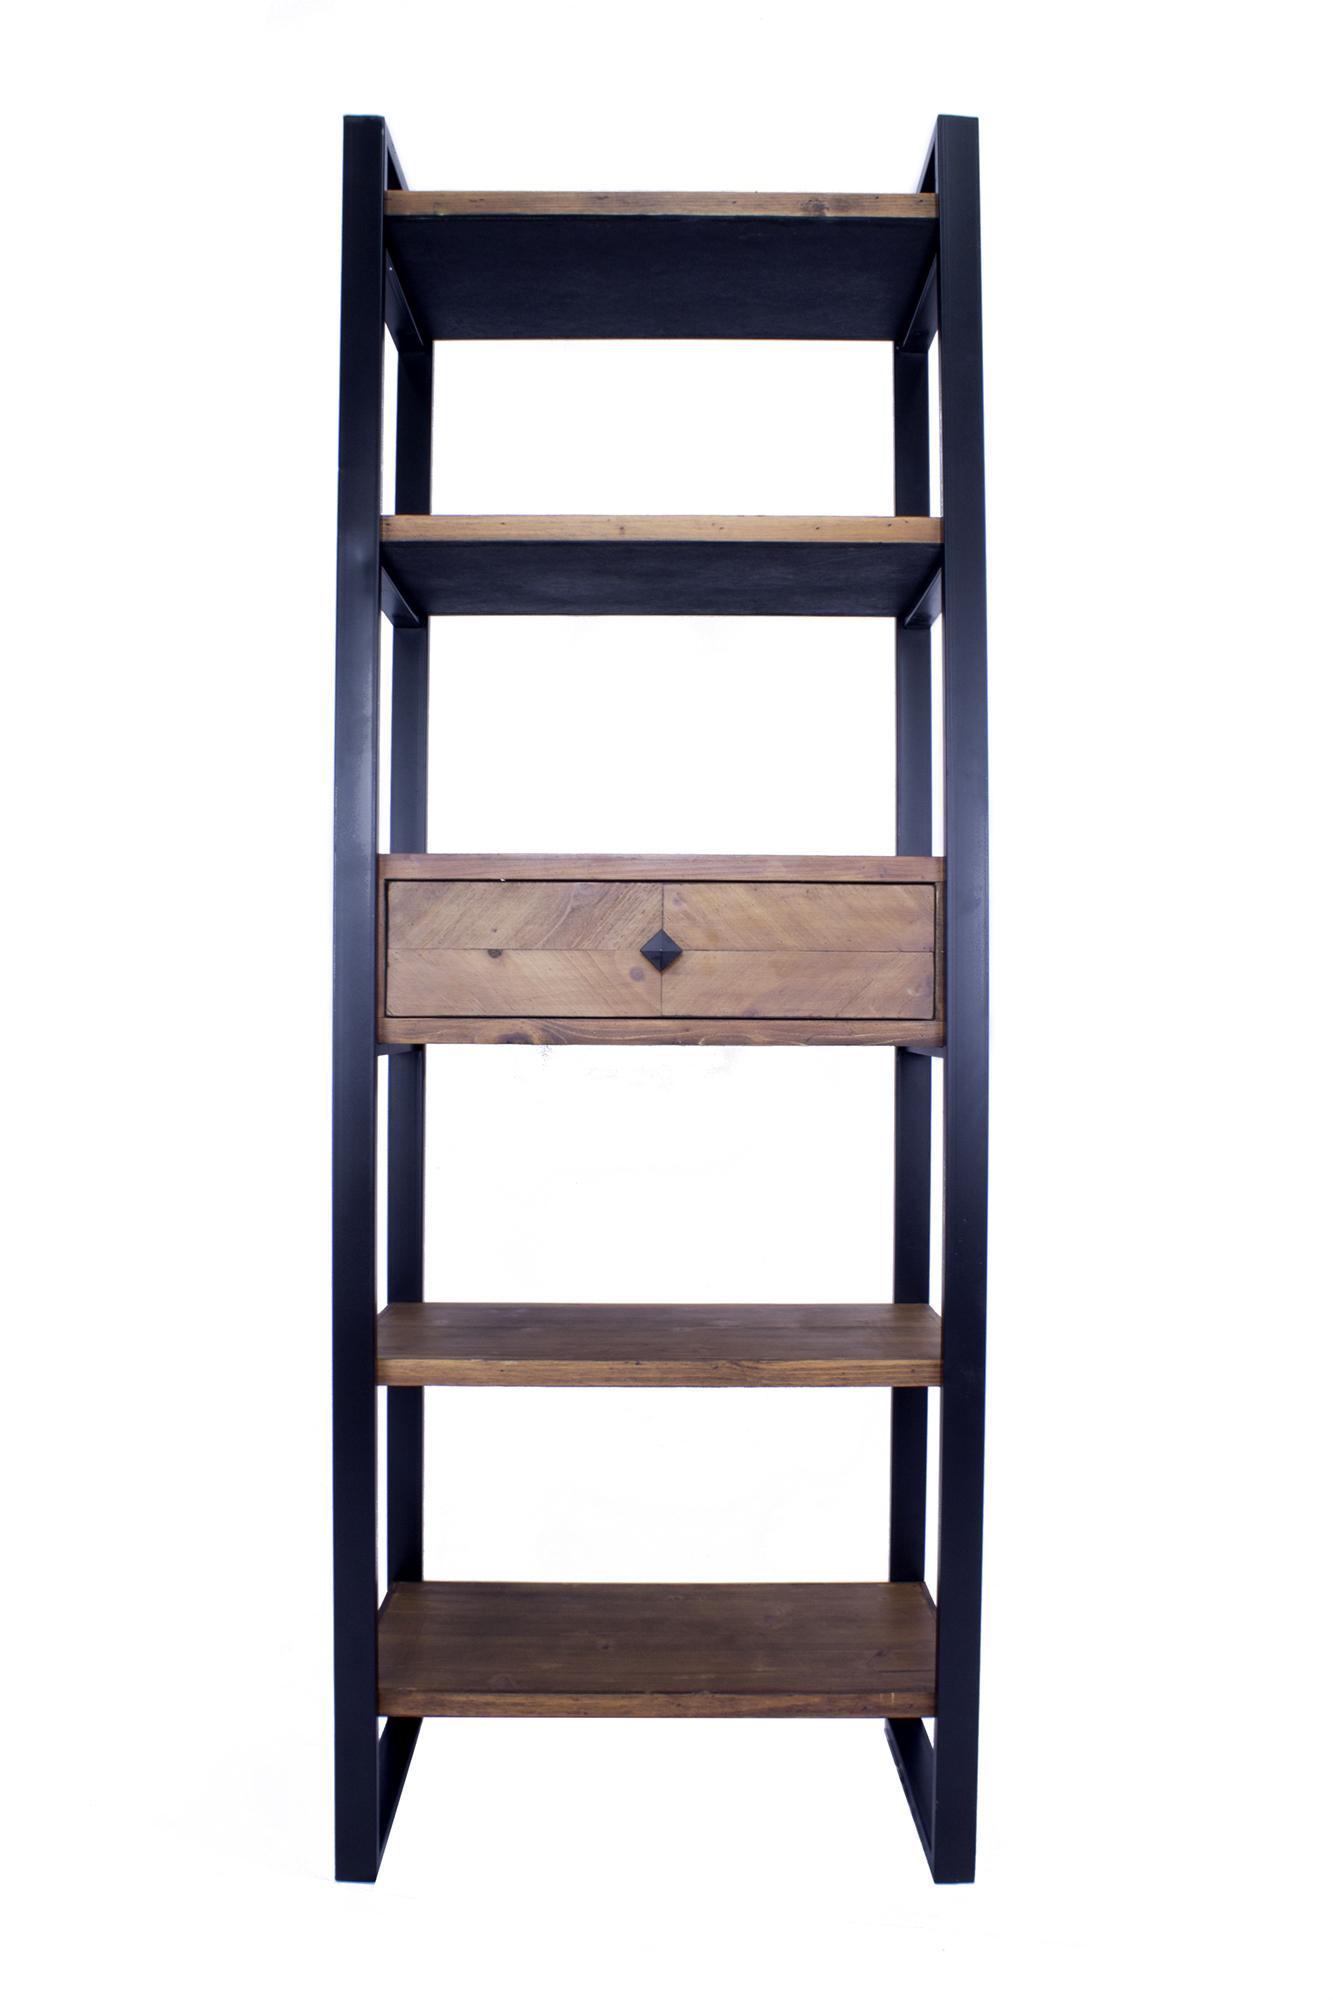 "24"" X 14.5"" X 67.25"" Natural Brown Metal Wood MDF Modern Shelf Drawer Bookcase and Display Organizer Brown"